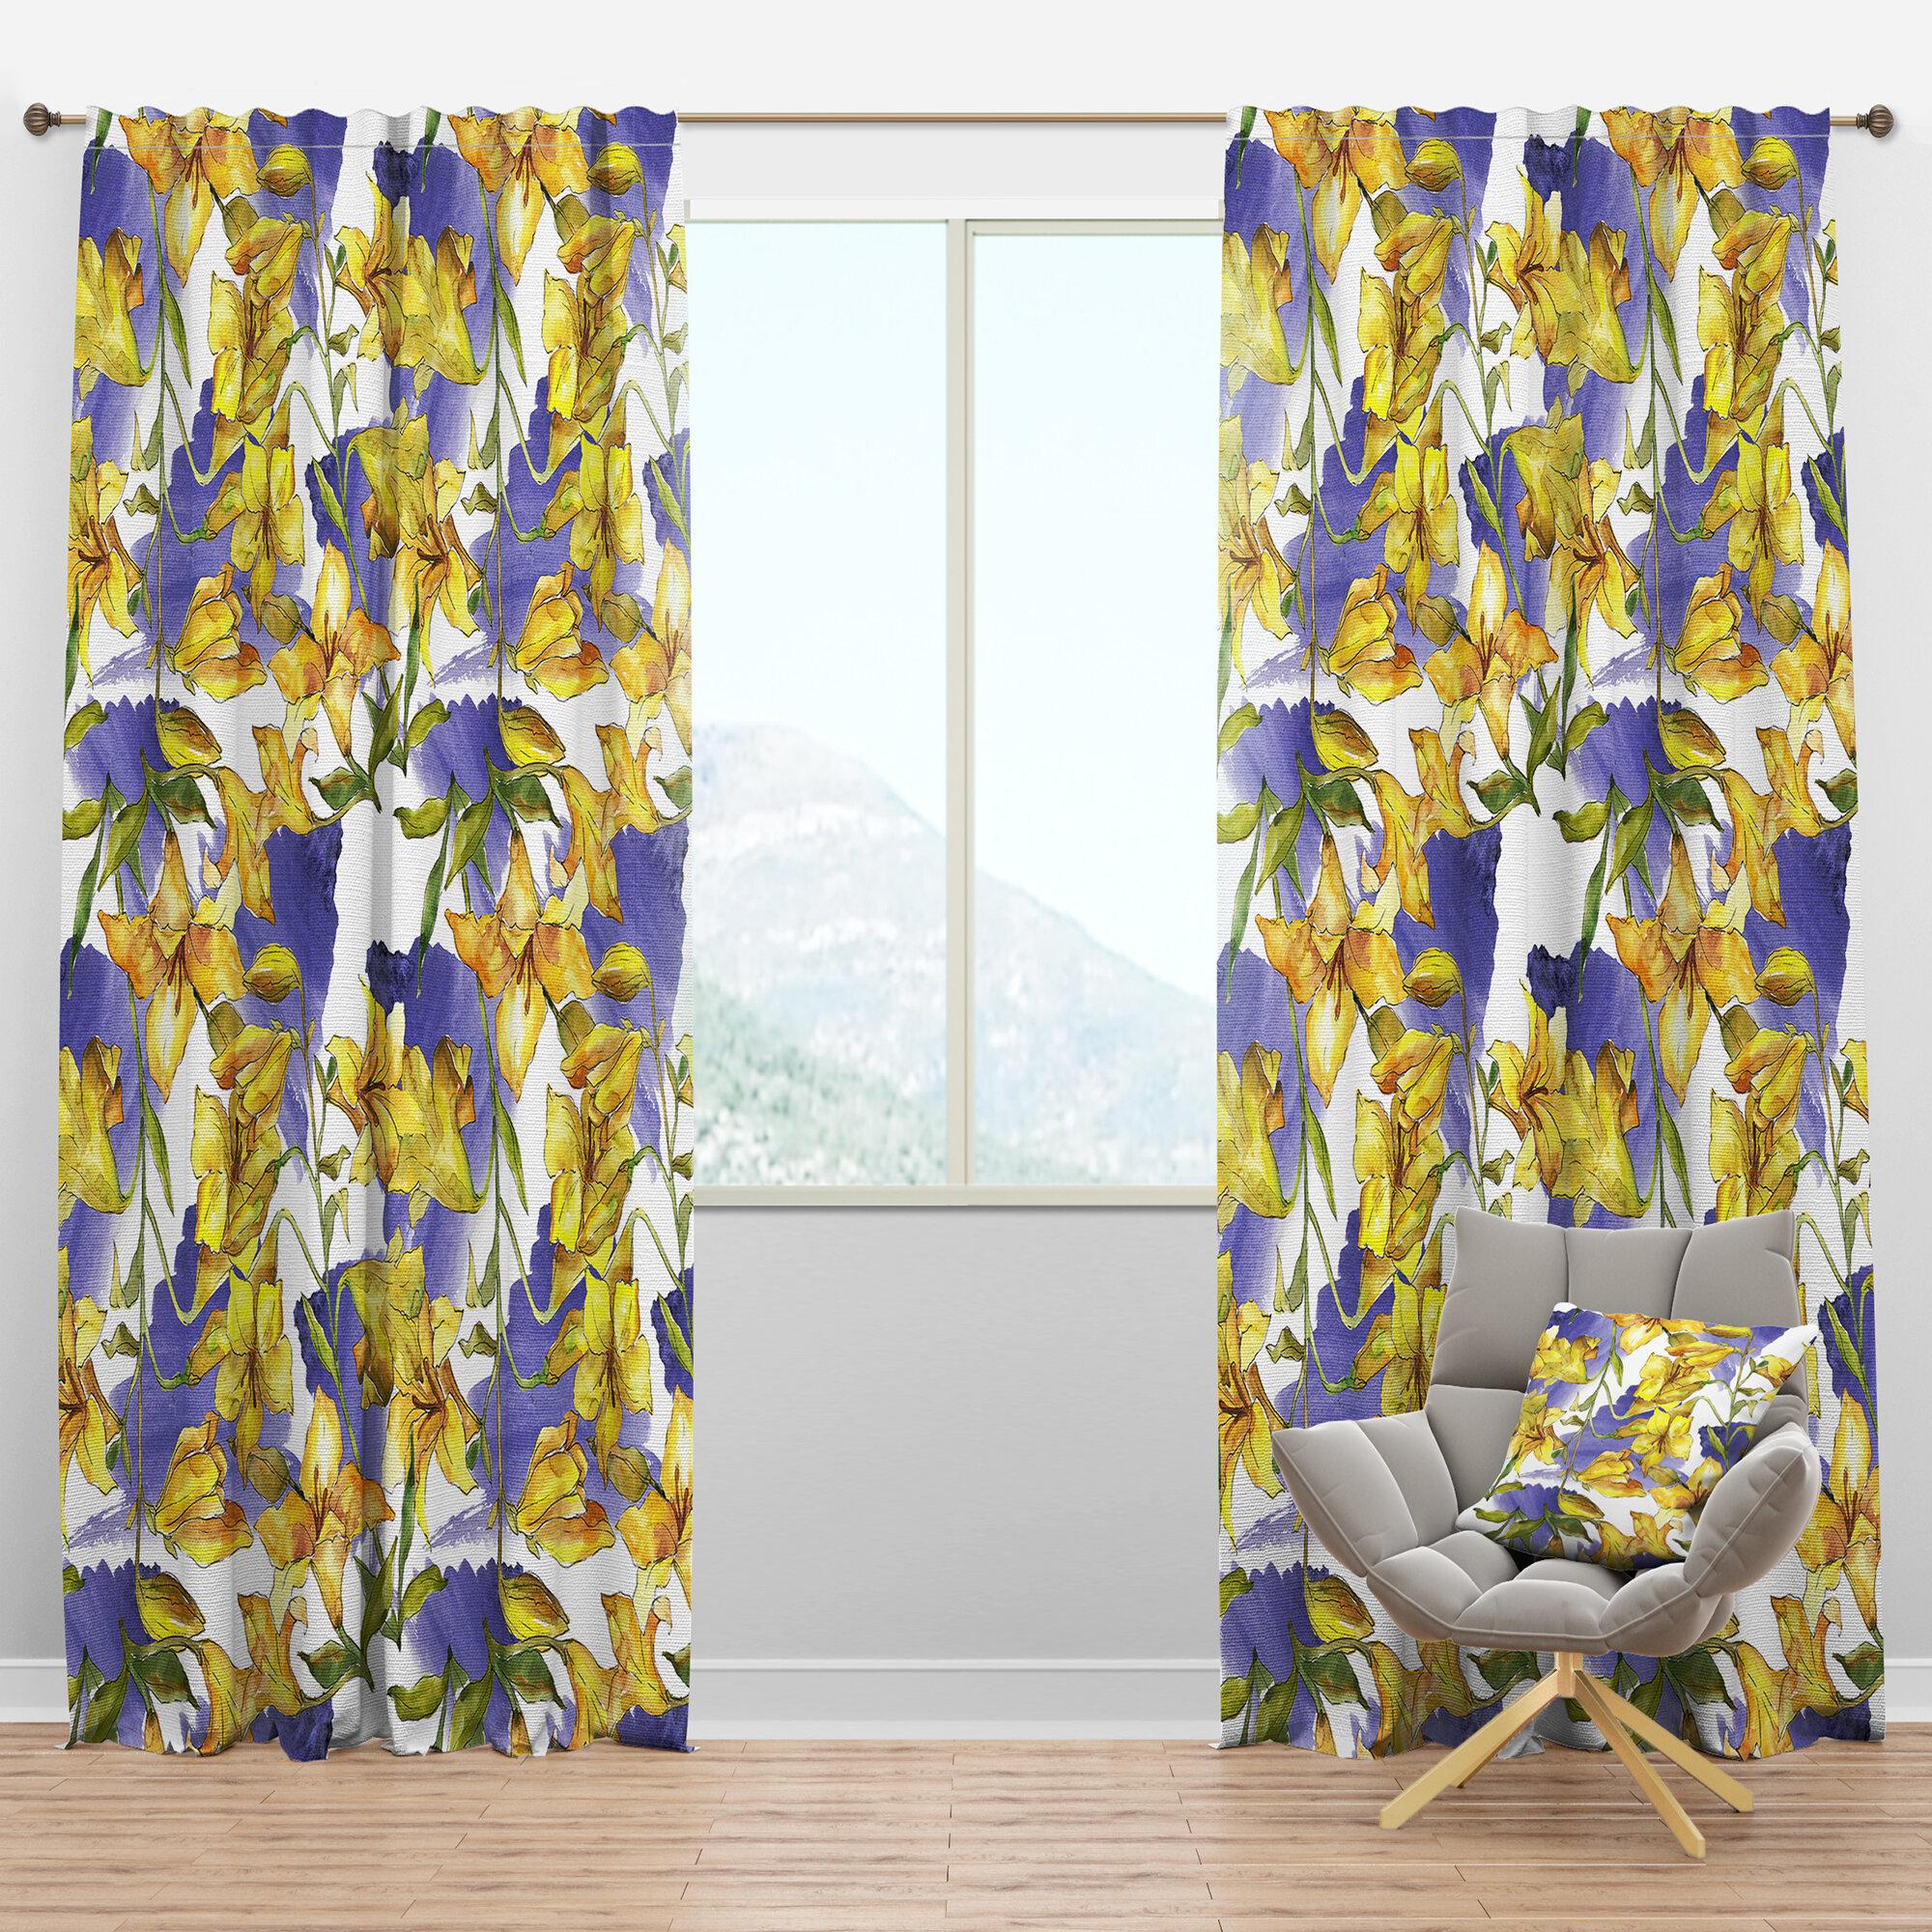 Designart Mid Century Handdrawn Poppies V Floral Semi Sheer Thermal Rod Pocket Curtain Panels Wayfair